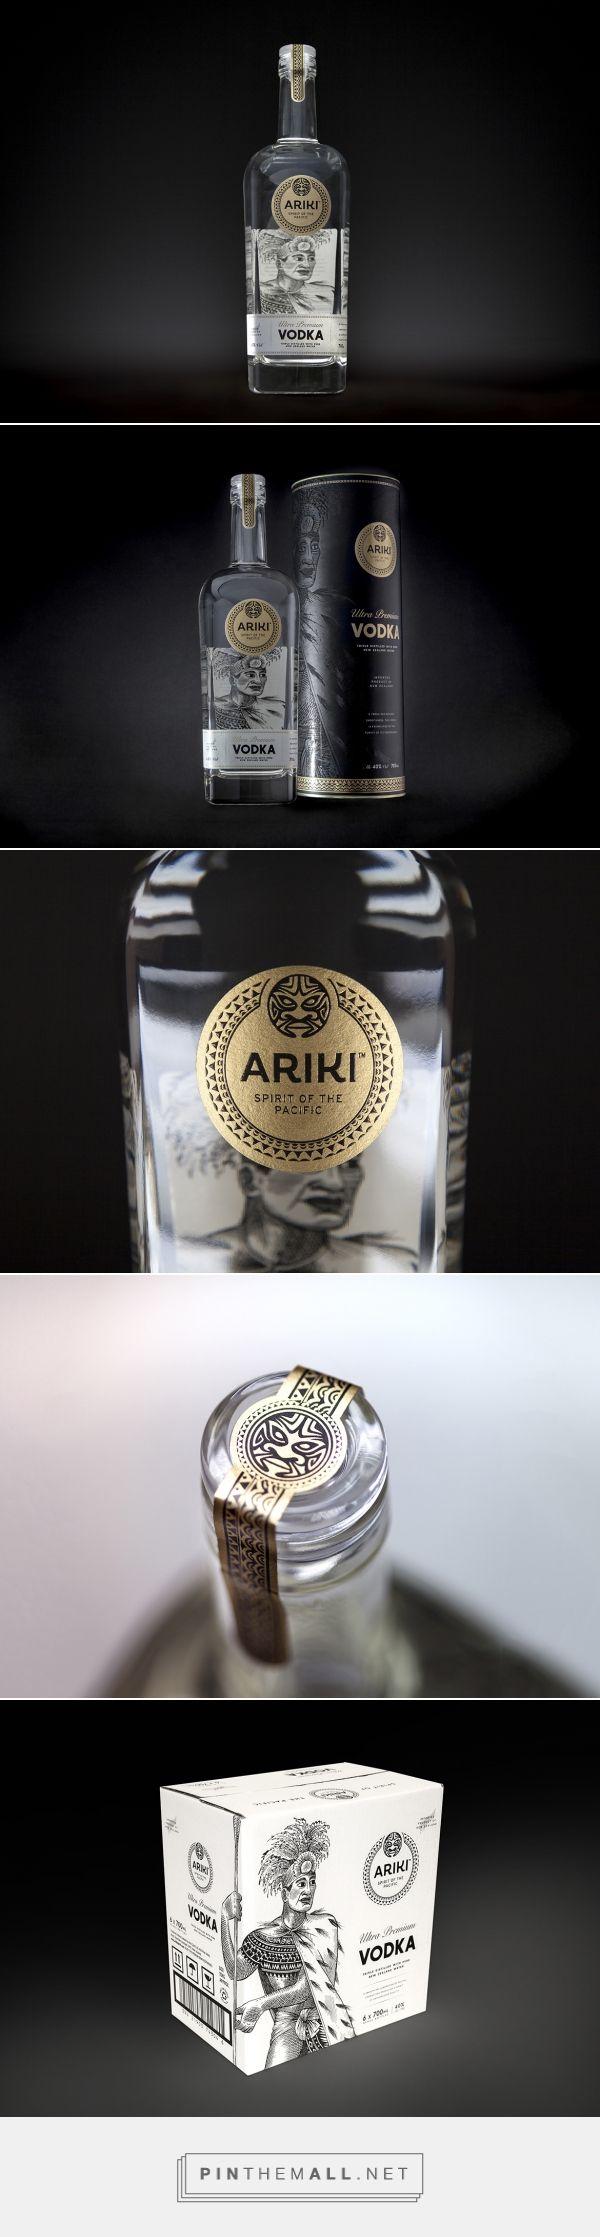 ARIKI Vodka Bottle - Packaging of the World - Creative Package Design Gallery - http://www.packagingoftheworld.com/2017/08/ariki-vodka-bottle.html